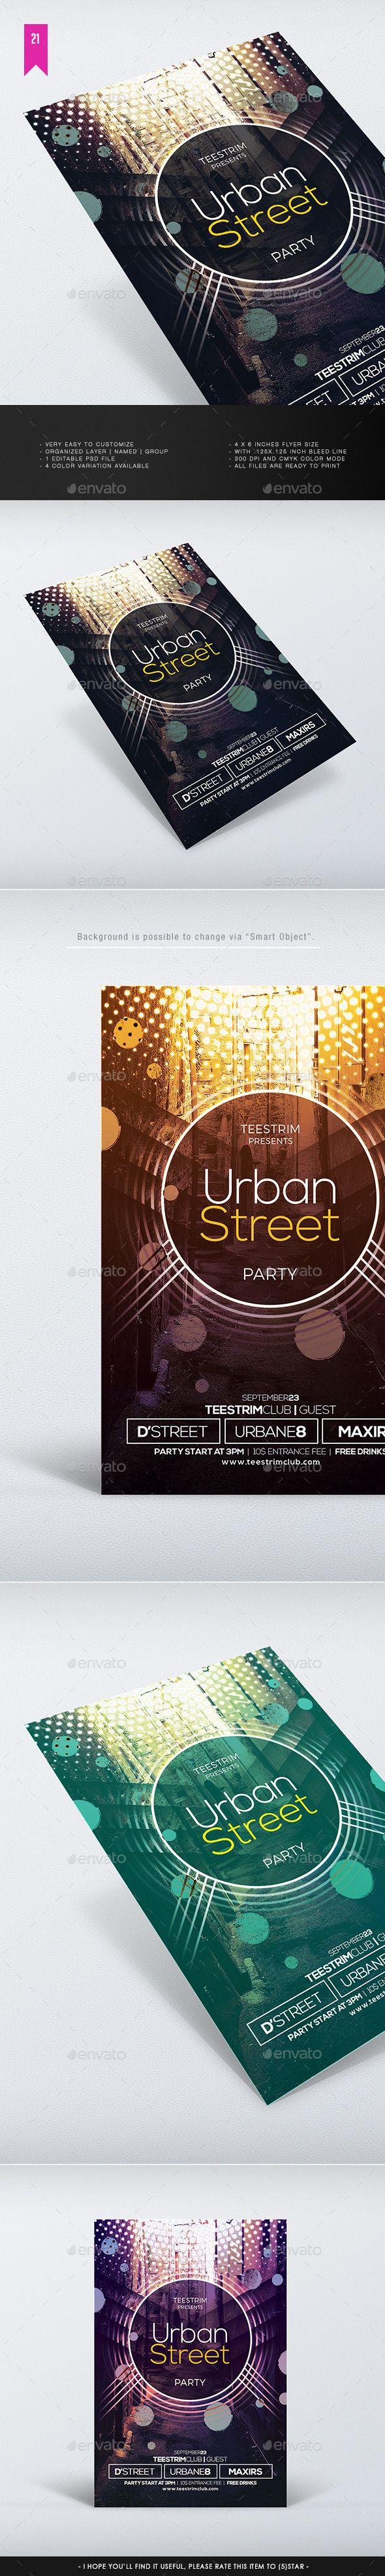 Urban Street Flyer Template #design Download: http://graphicriver.net/item/urban-street-flyer-template/12416762?ref=ksioks